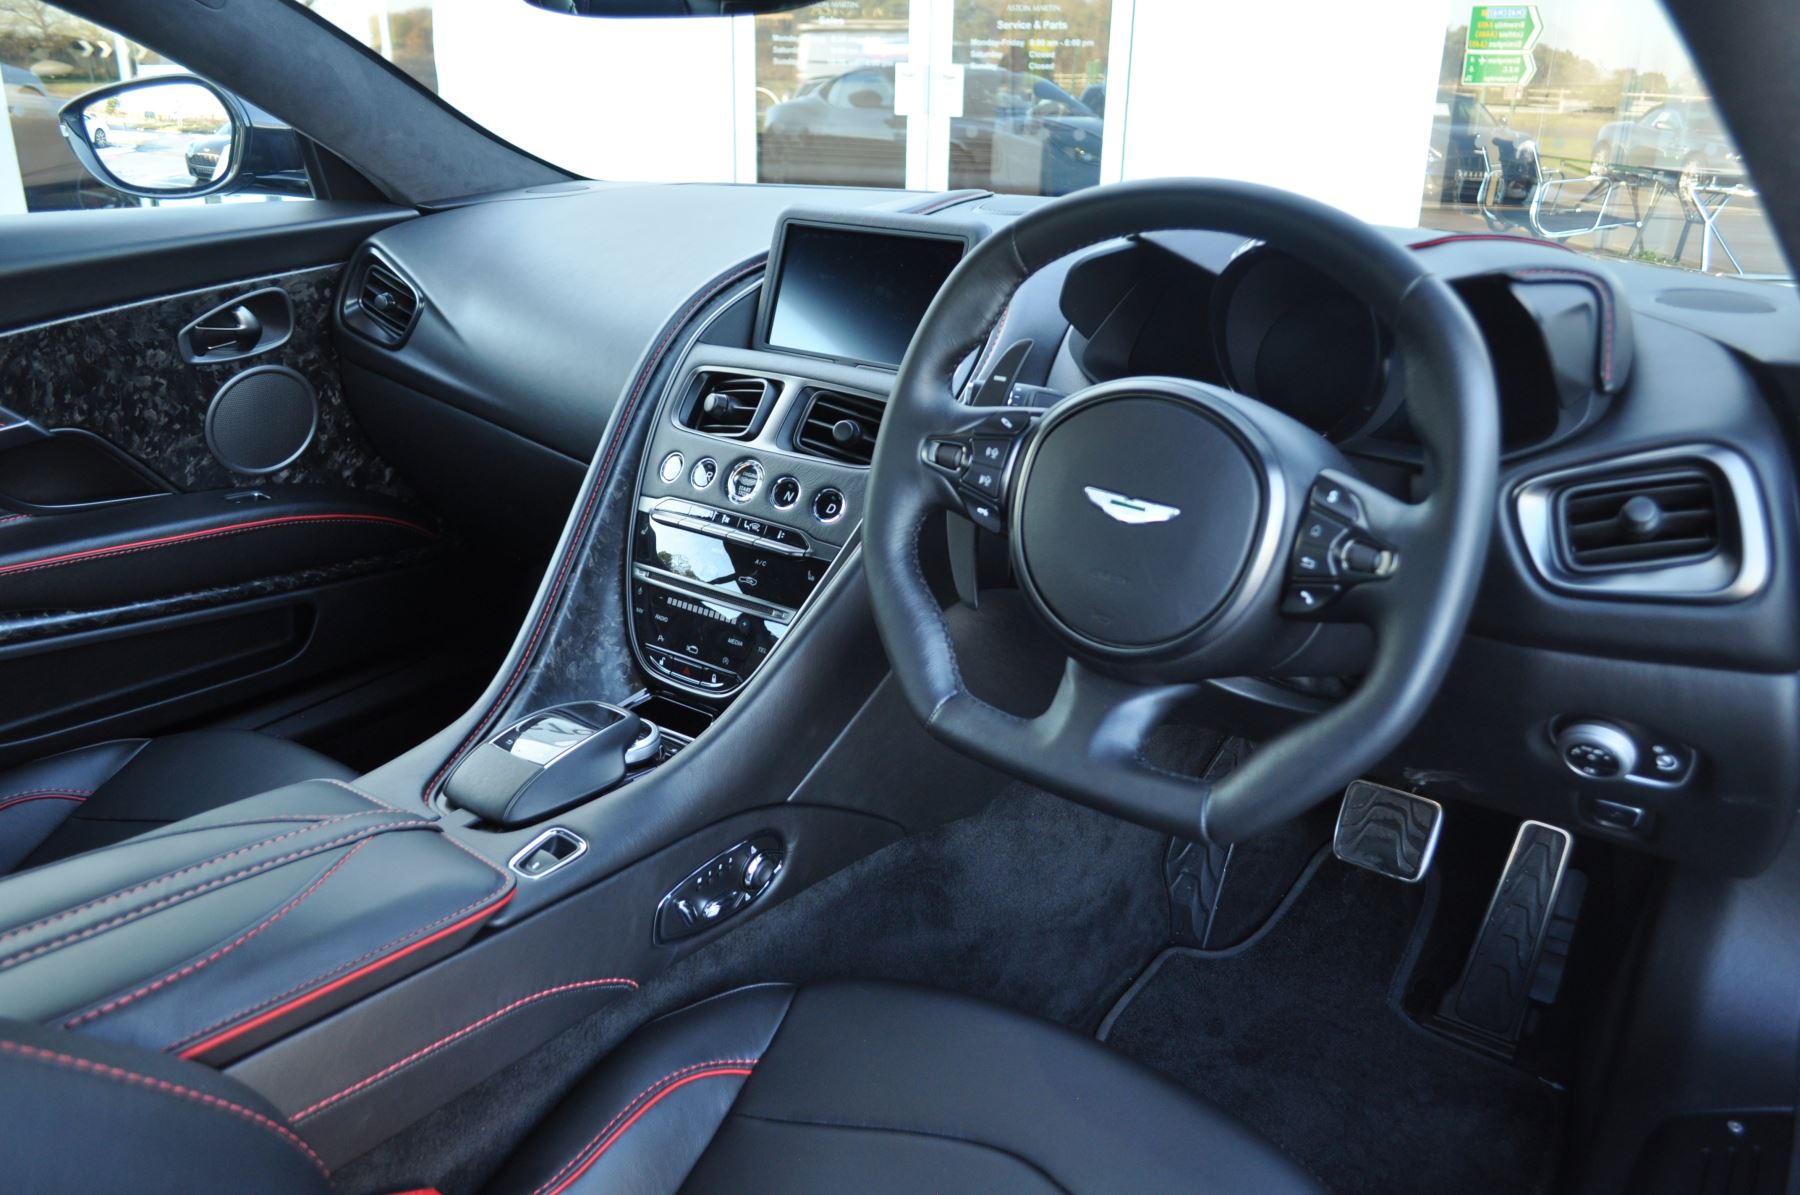 Aston Martin DBS V12 Superleggera Touchtronic image 14